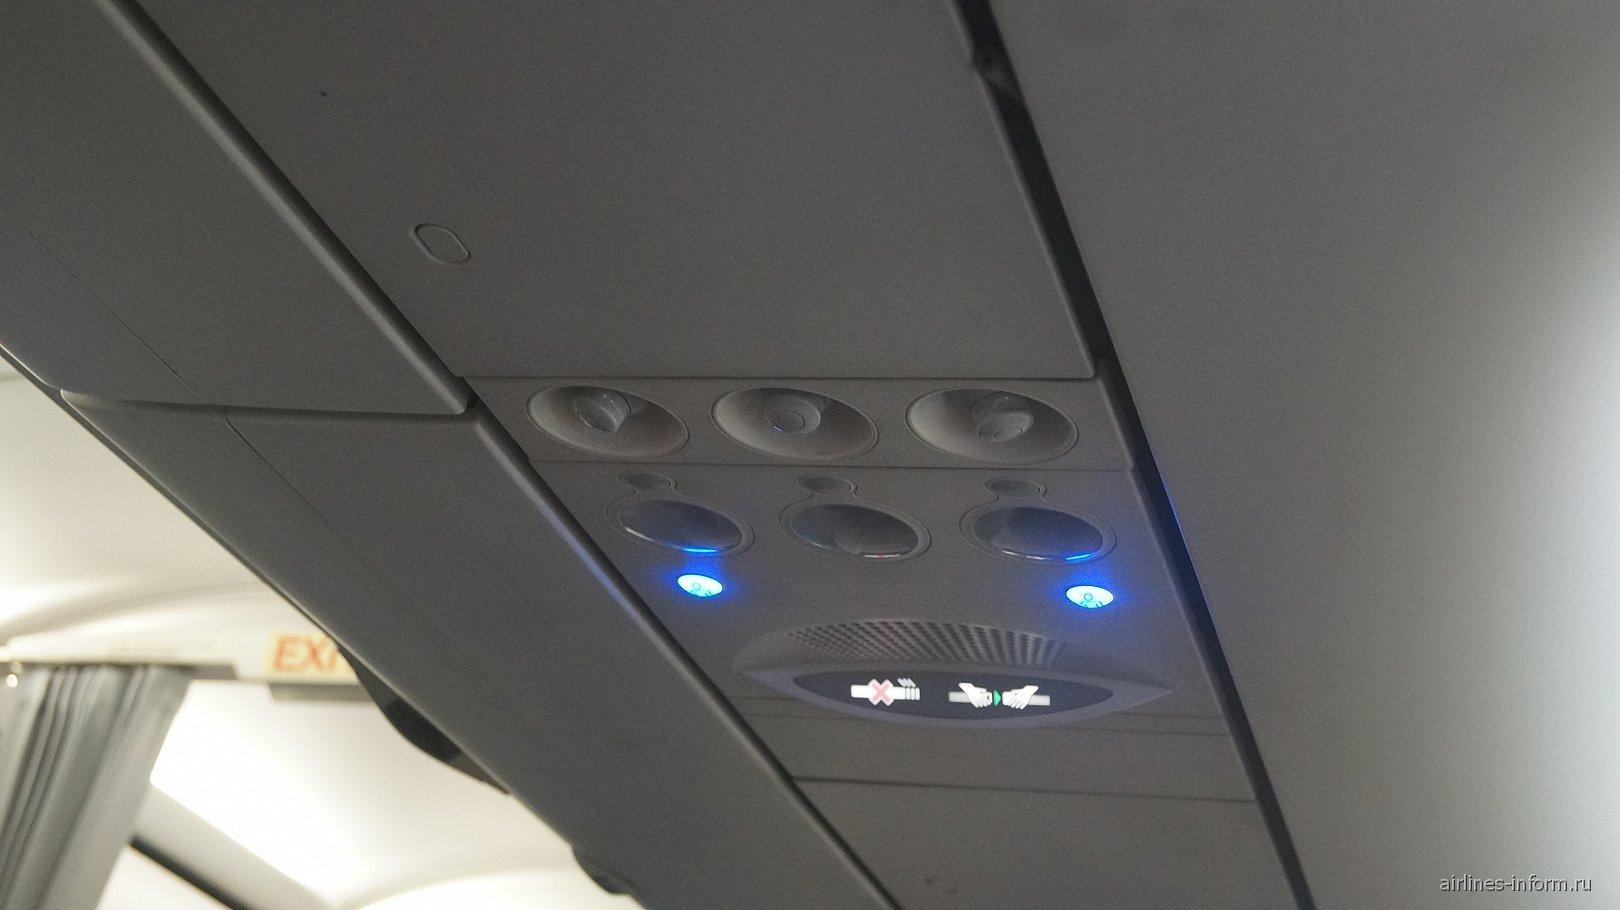 Салон самолета Airbus A319 Аэрофлота